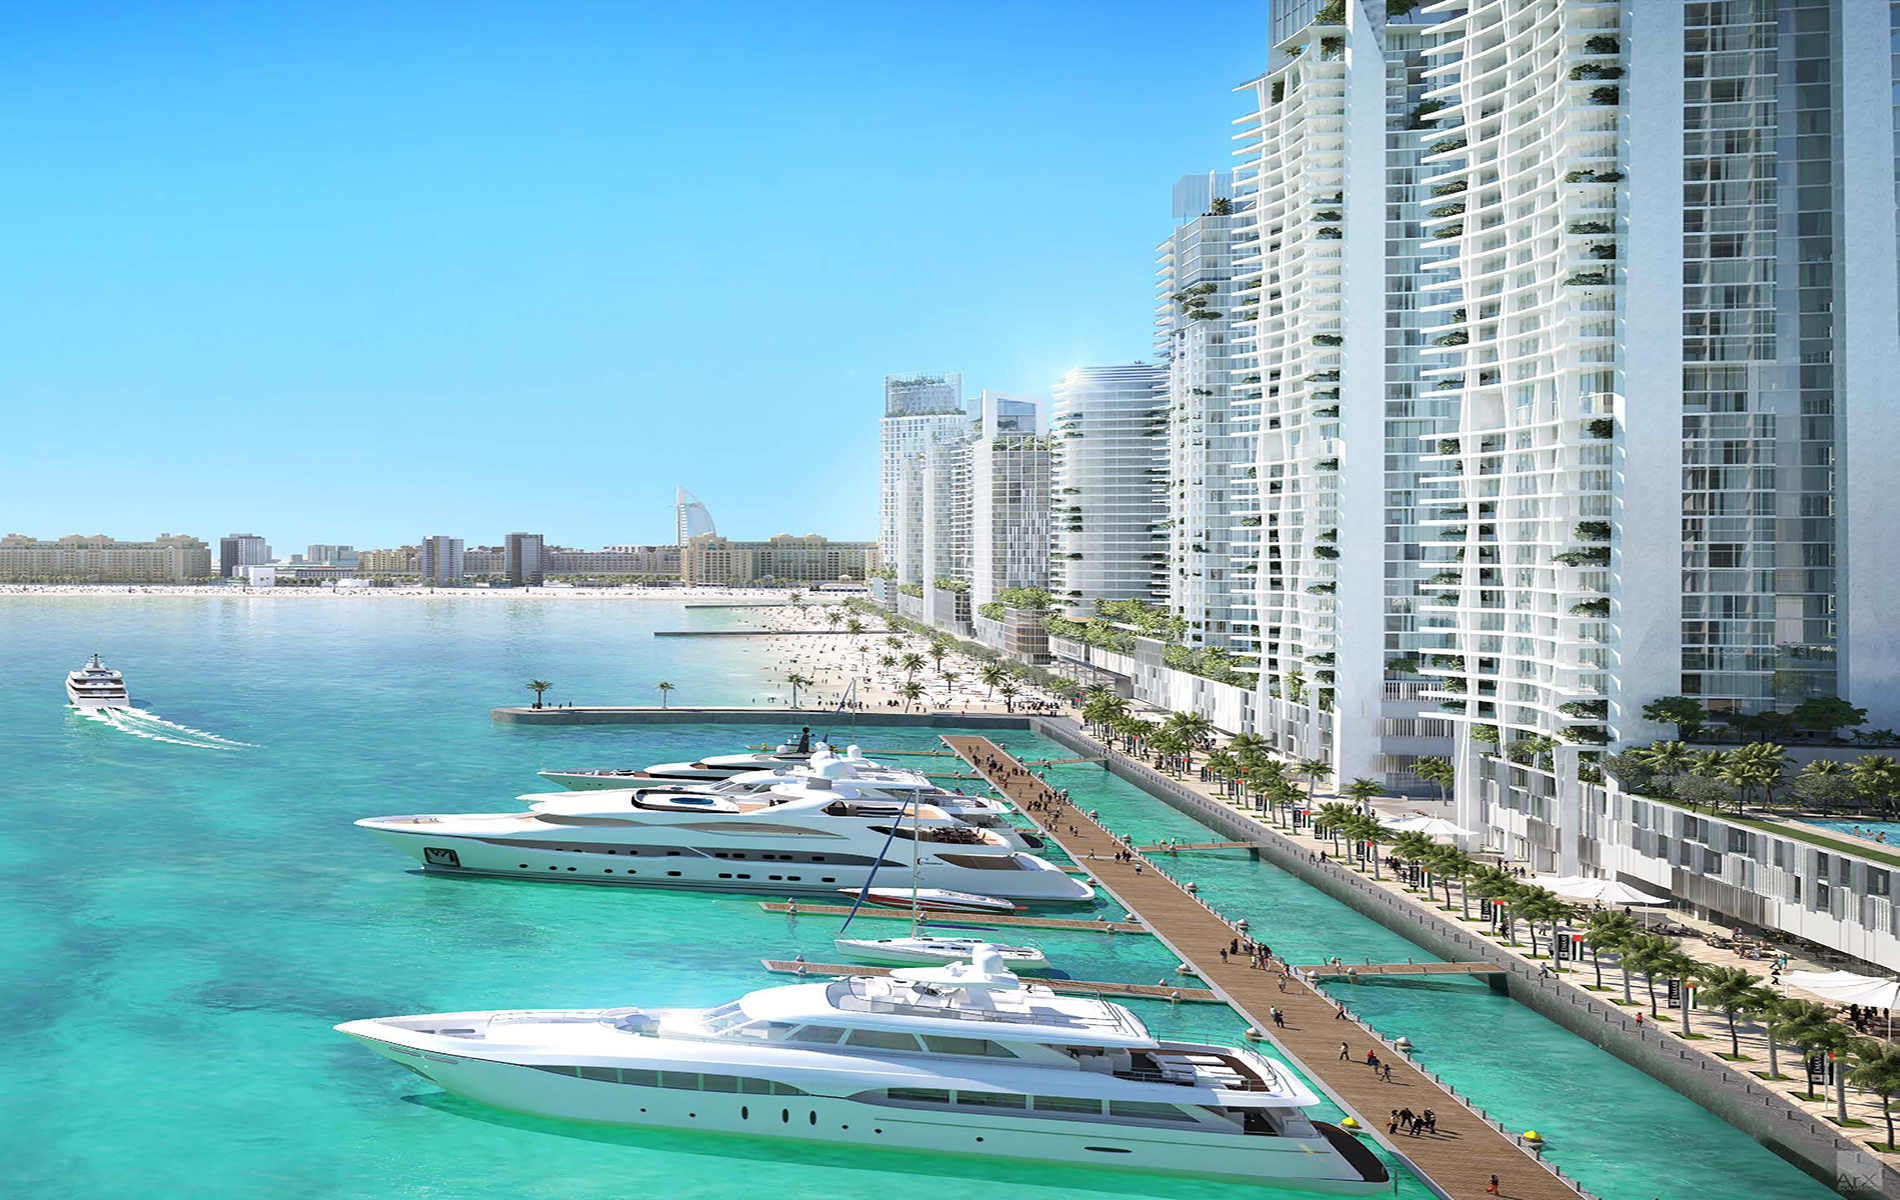 676253beach-vista-emaar-beachfront-hero.jpg